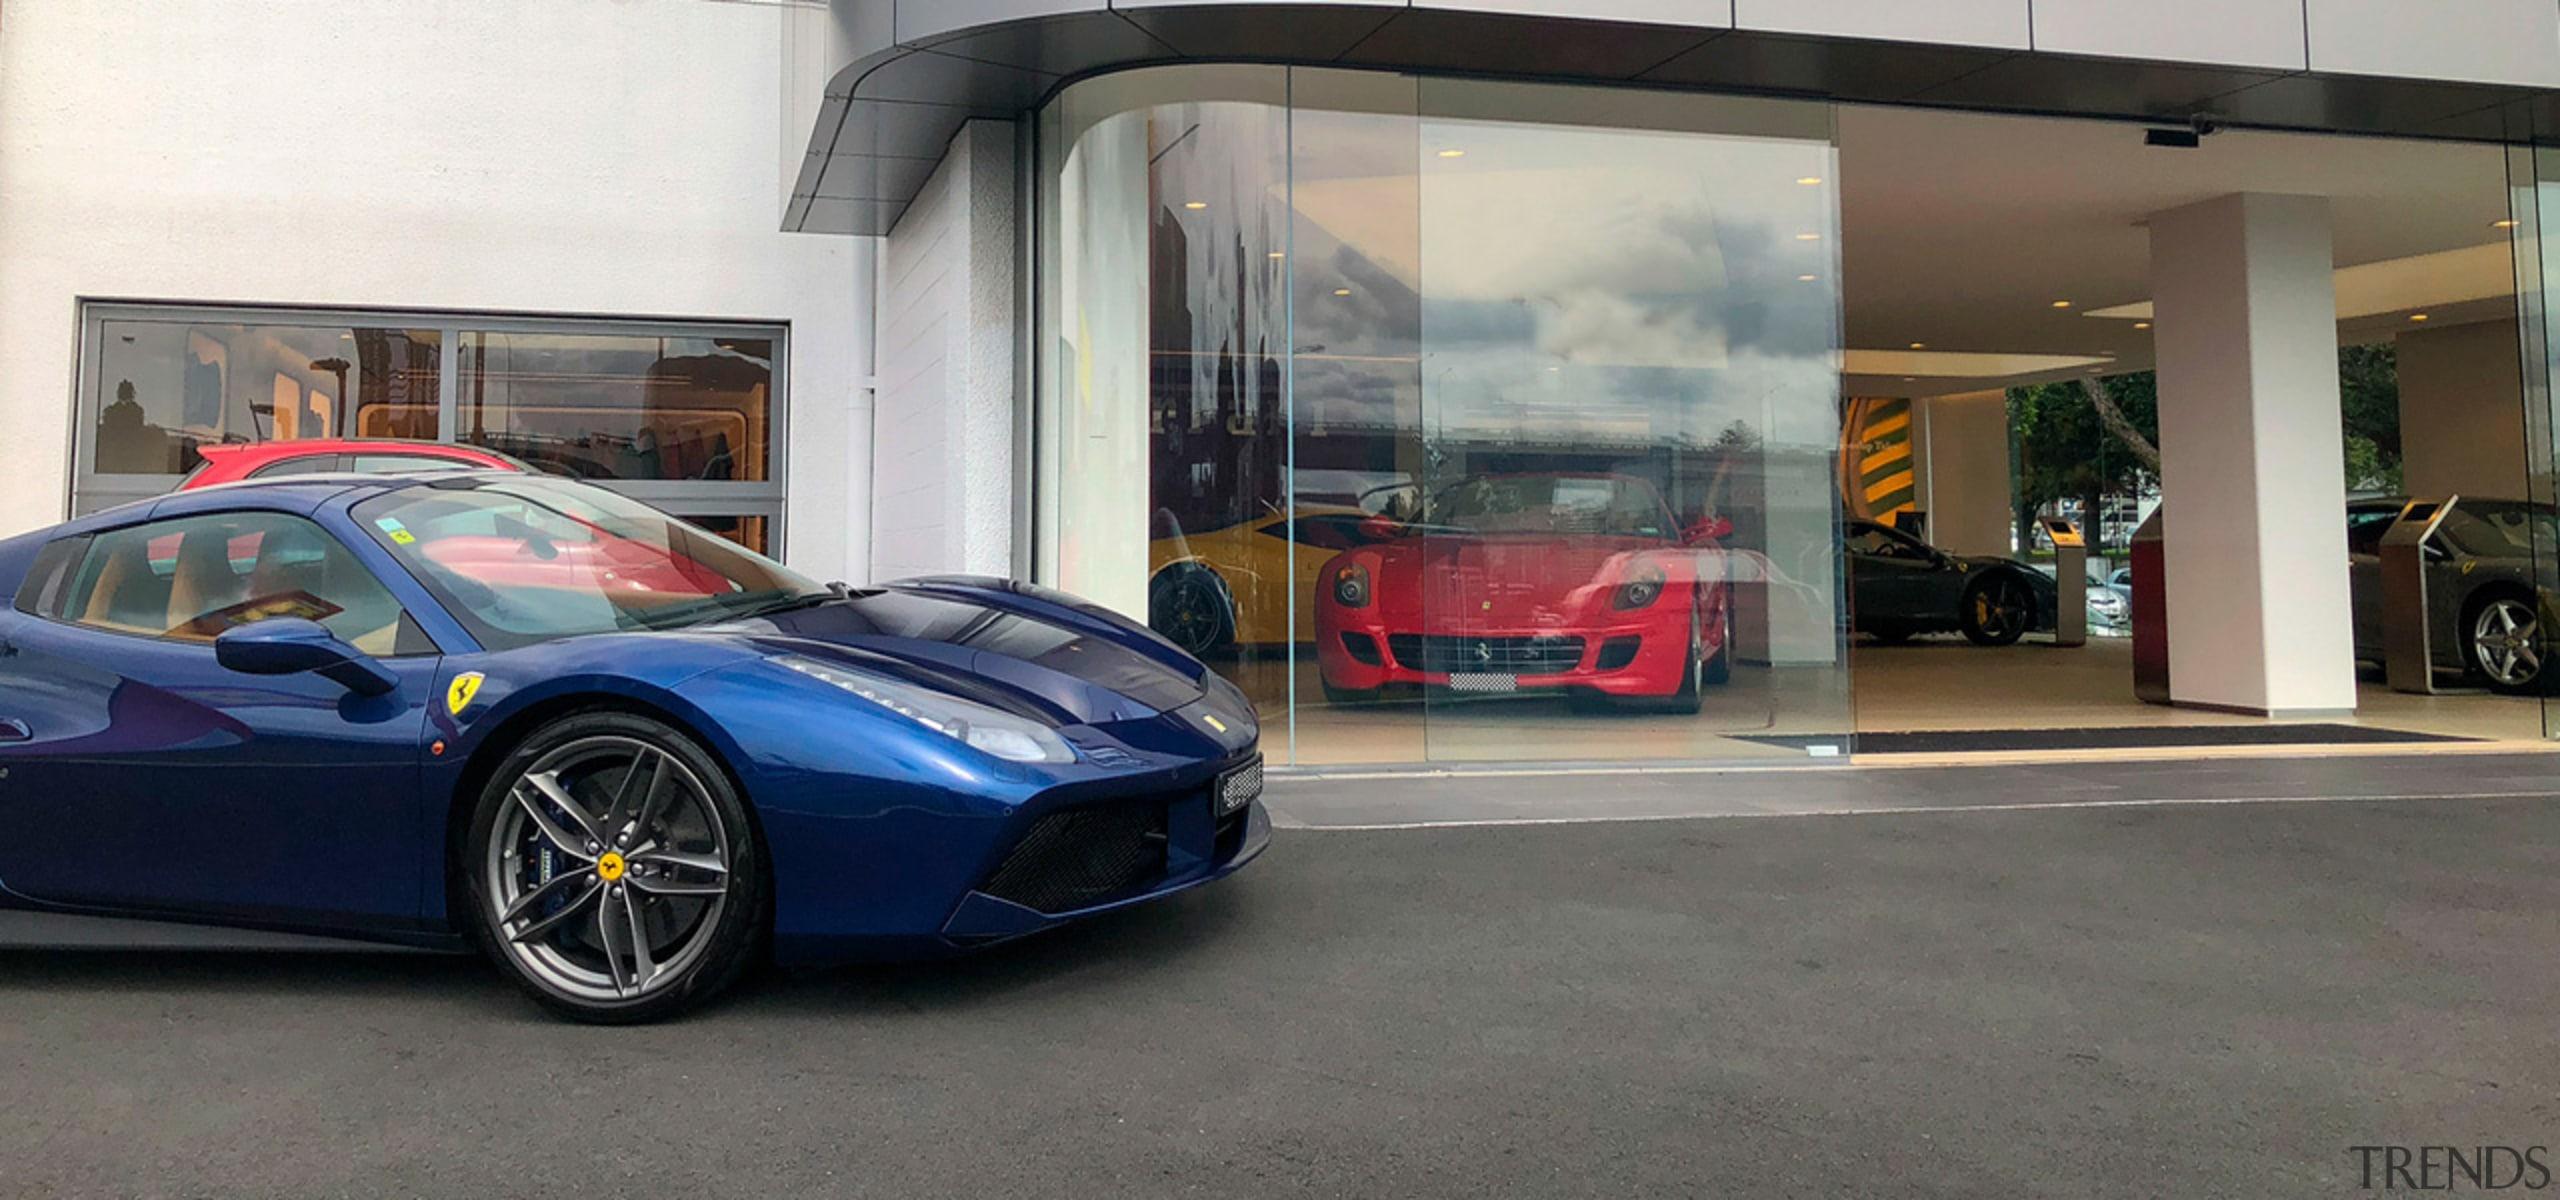 Ferrari Showroom 4 - automotive design | automotive automotive design, automotive exterior, car, lamborghini, land vehicle, luxury vehicle, performance car, sports car, supercar, vehicle, gray